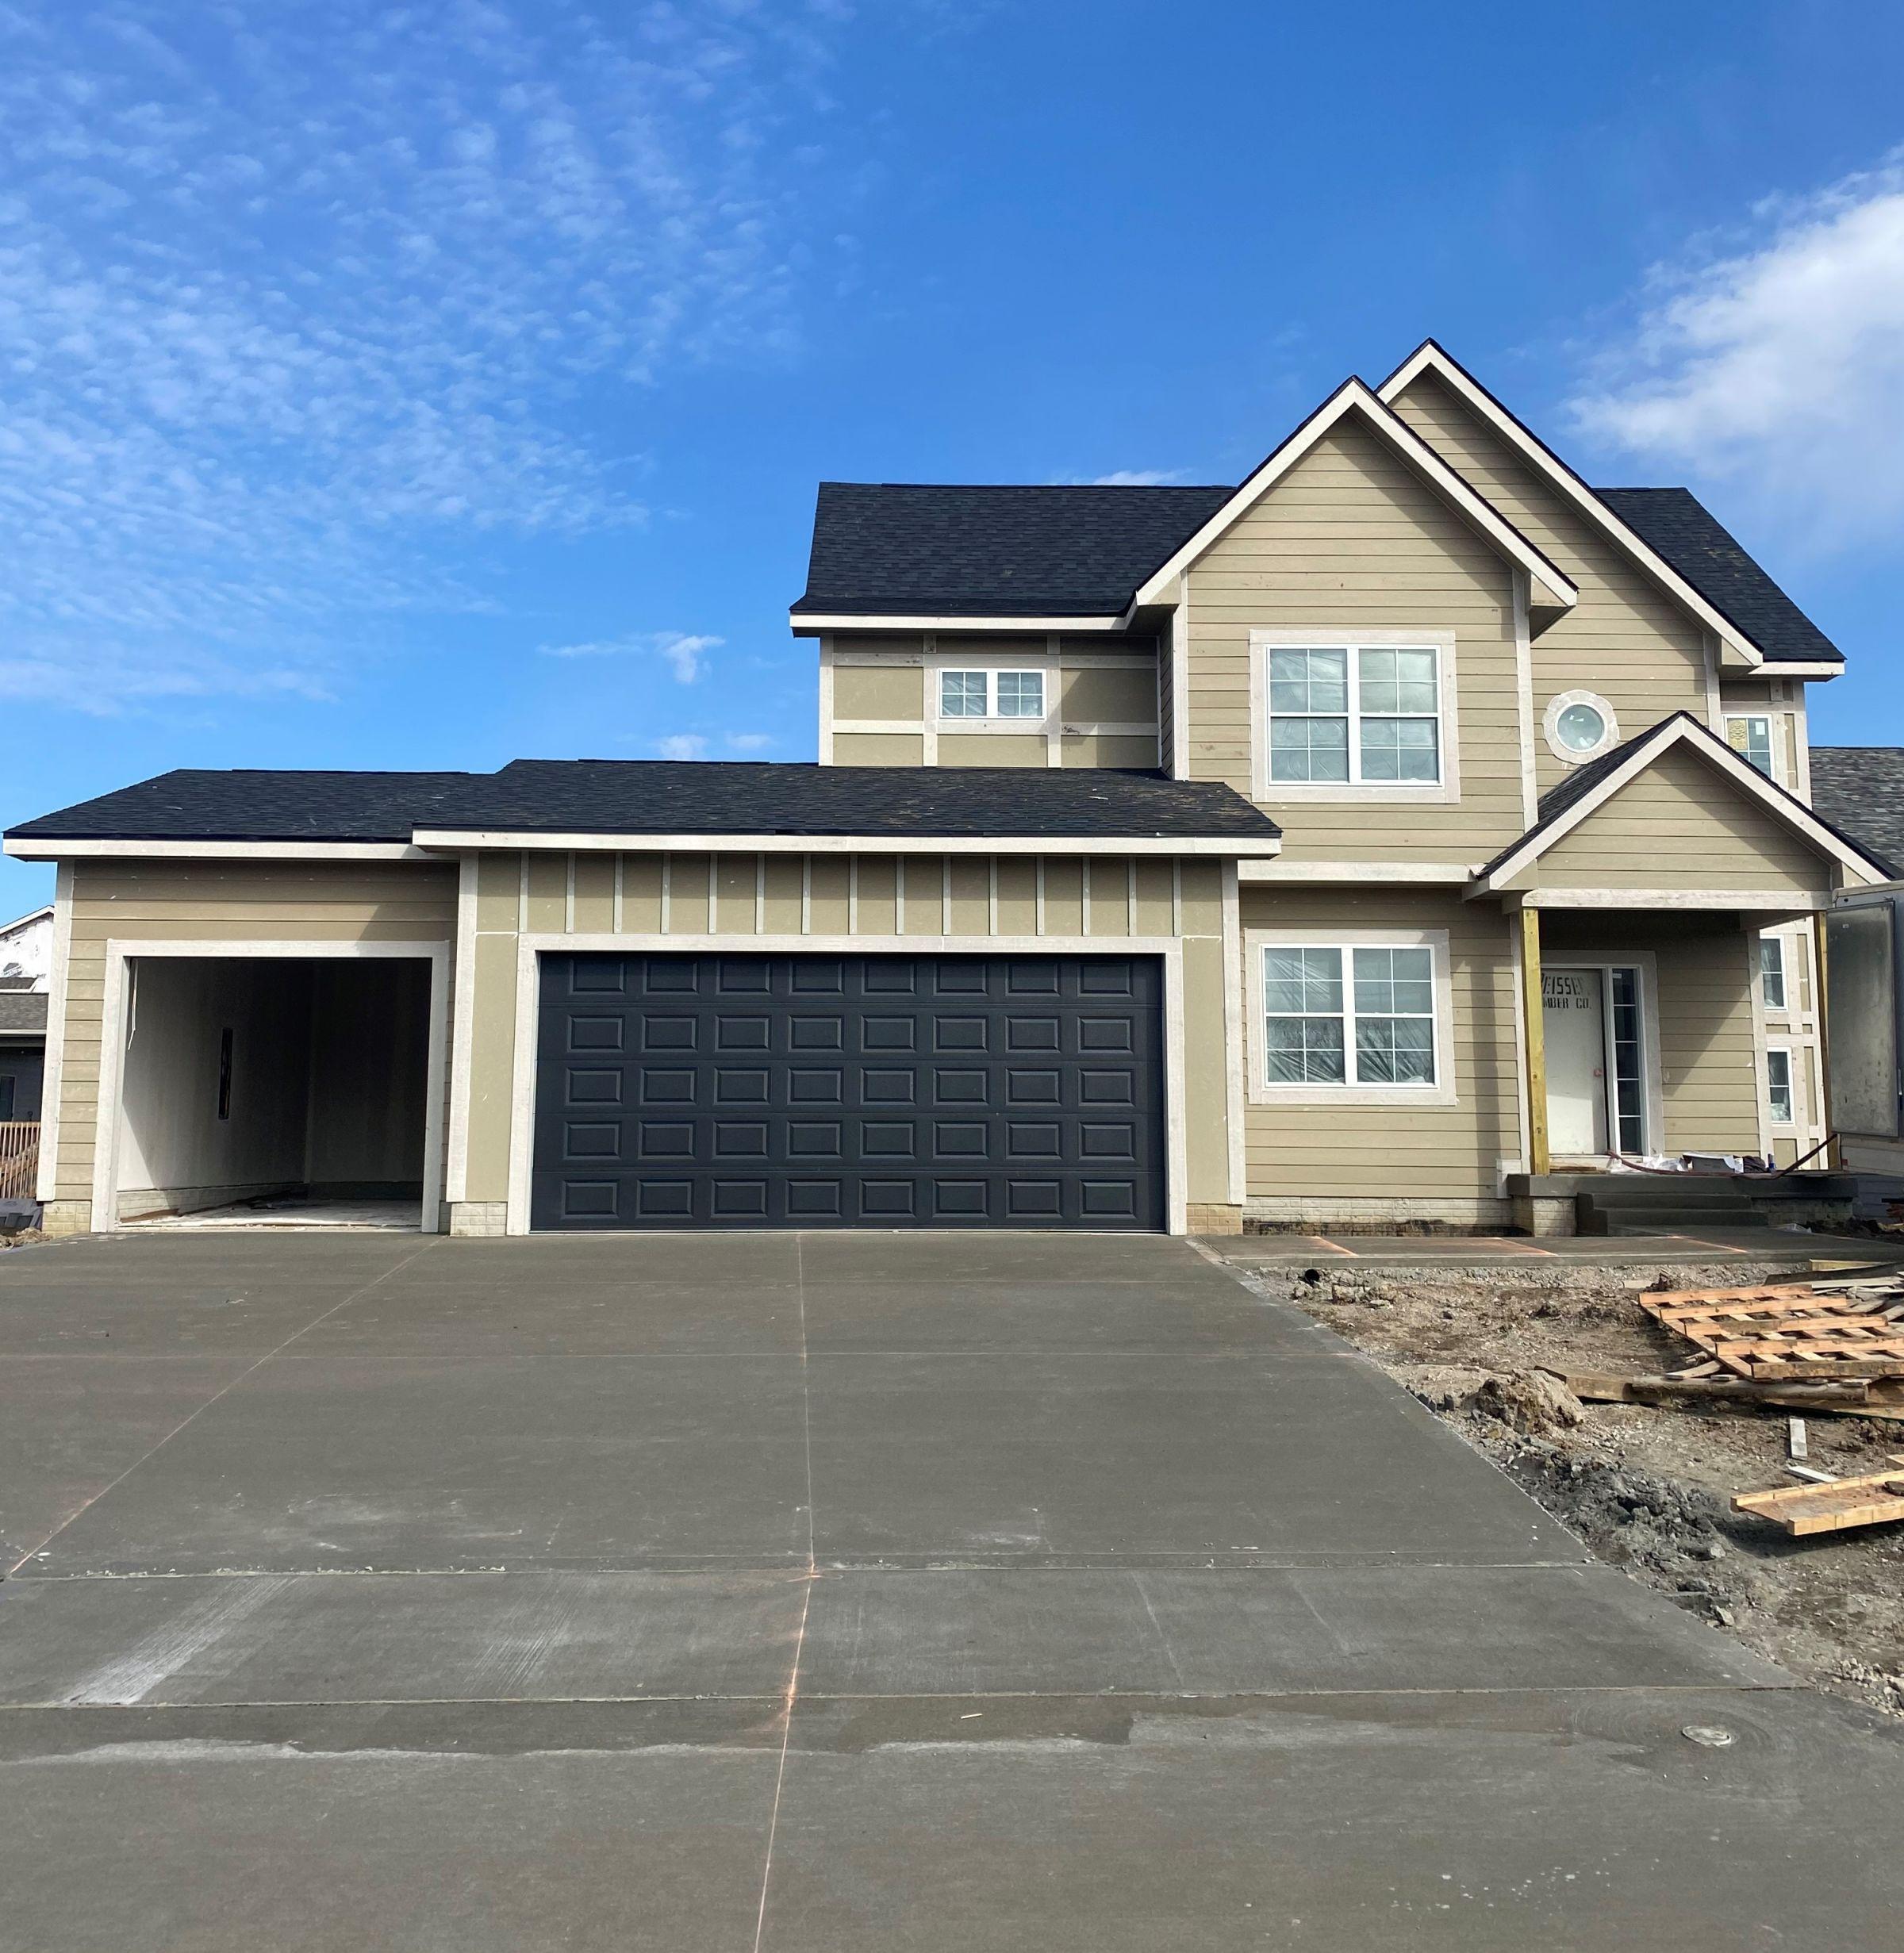 residential-polk-county-iowa-0-acres-listing-number-15240-0-2021-03-10-185208.jpg